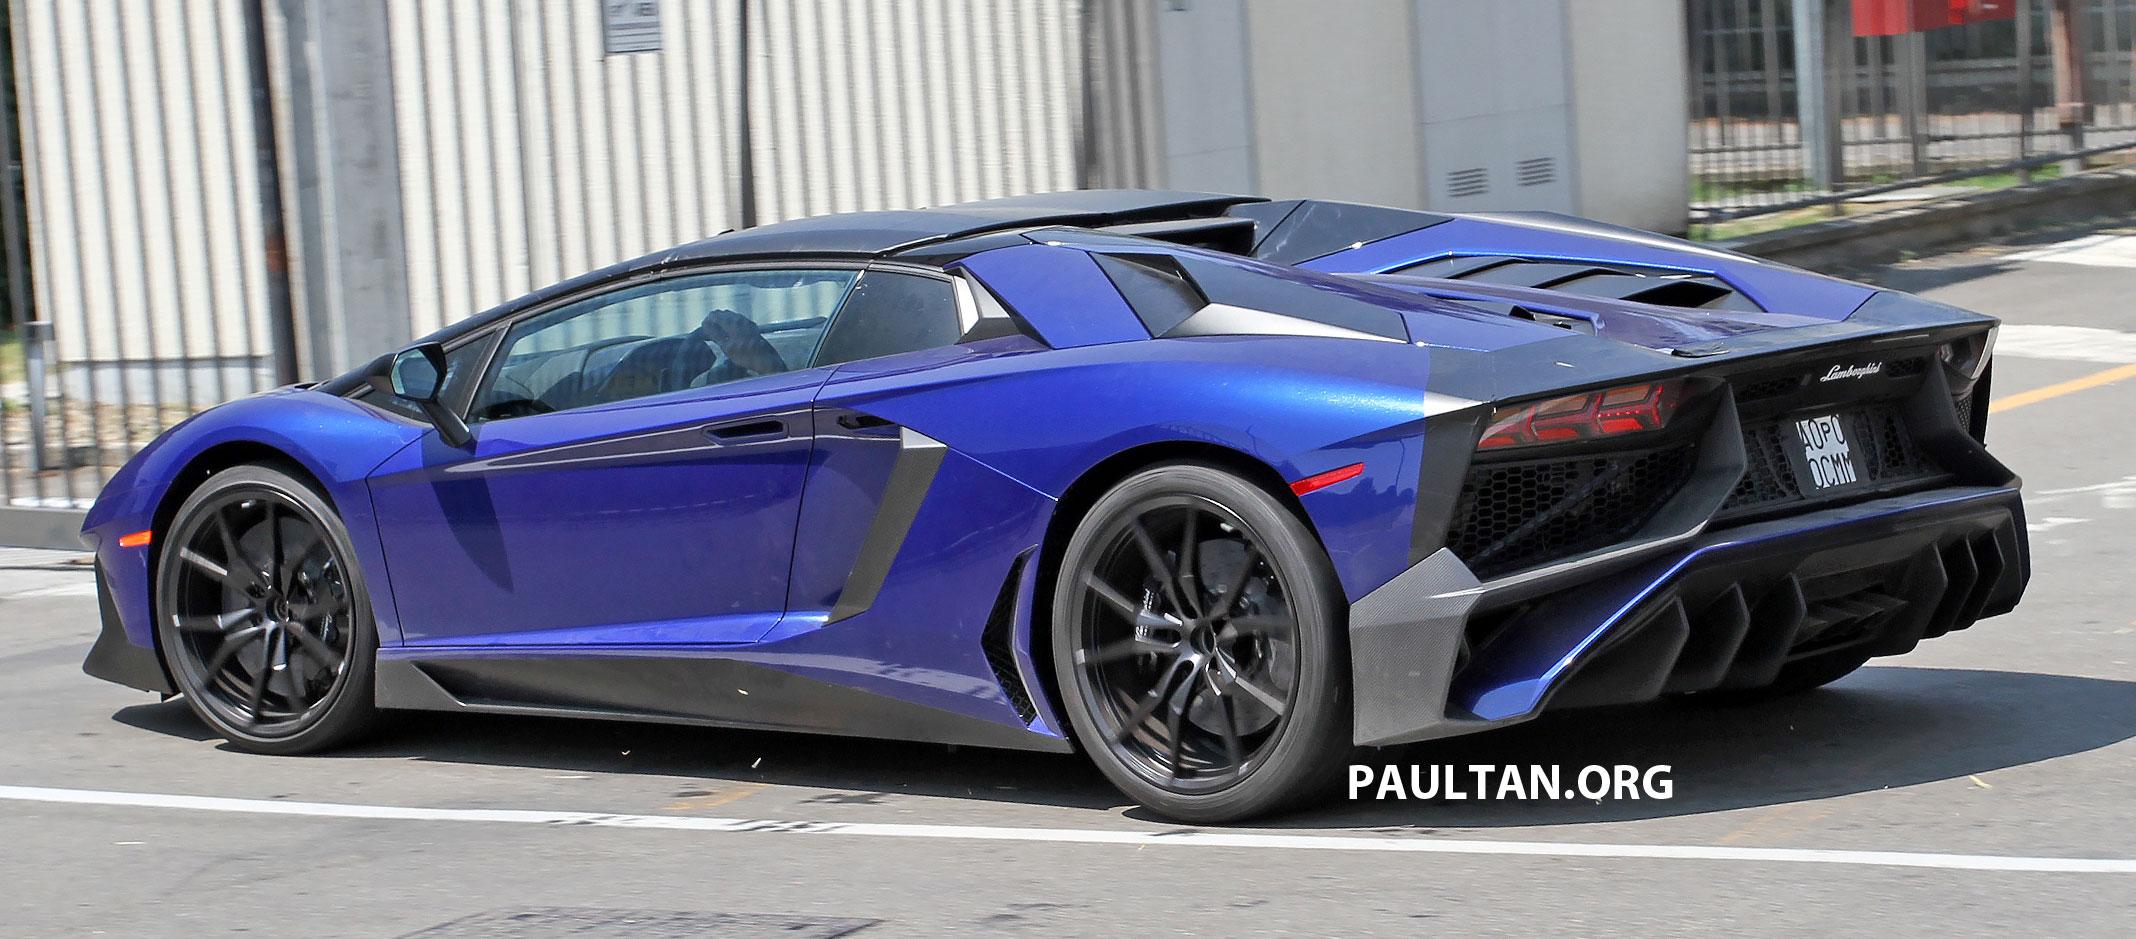 Spied Lamborghini Aventador Lp750 4 Sv Roadster Captured Sans Camo September Debut In